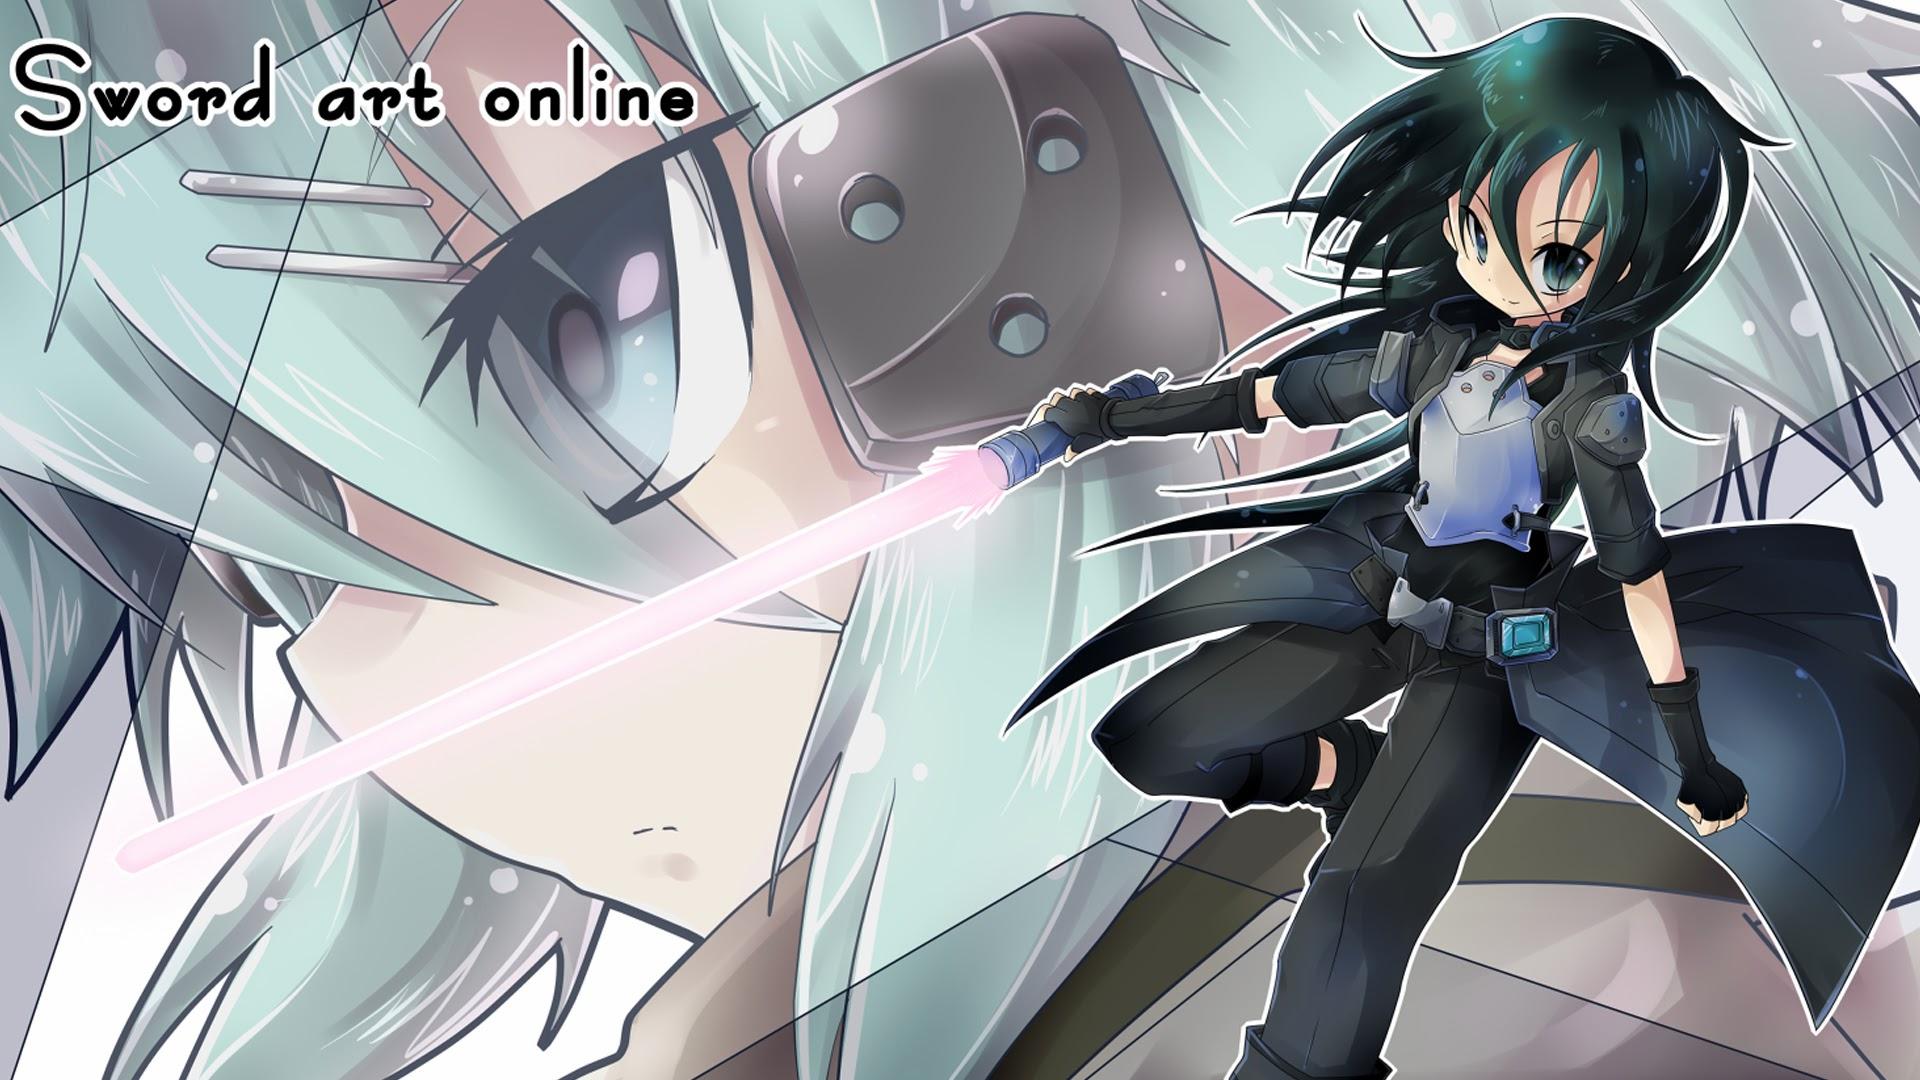 Sinon and Kirito Gun Gale 7v Wallpaper HD